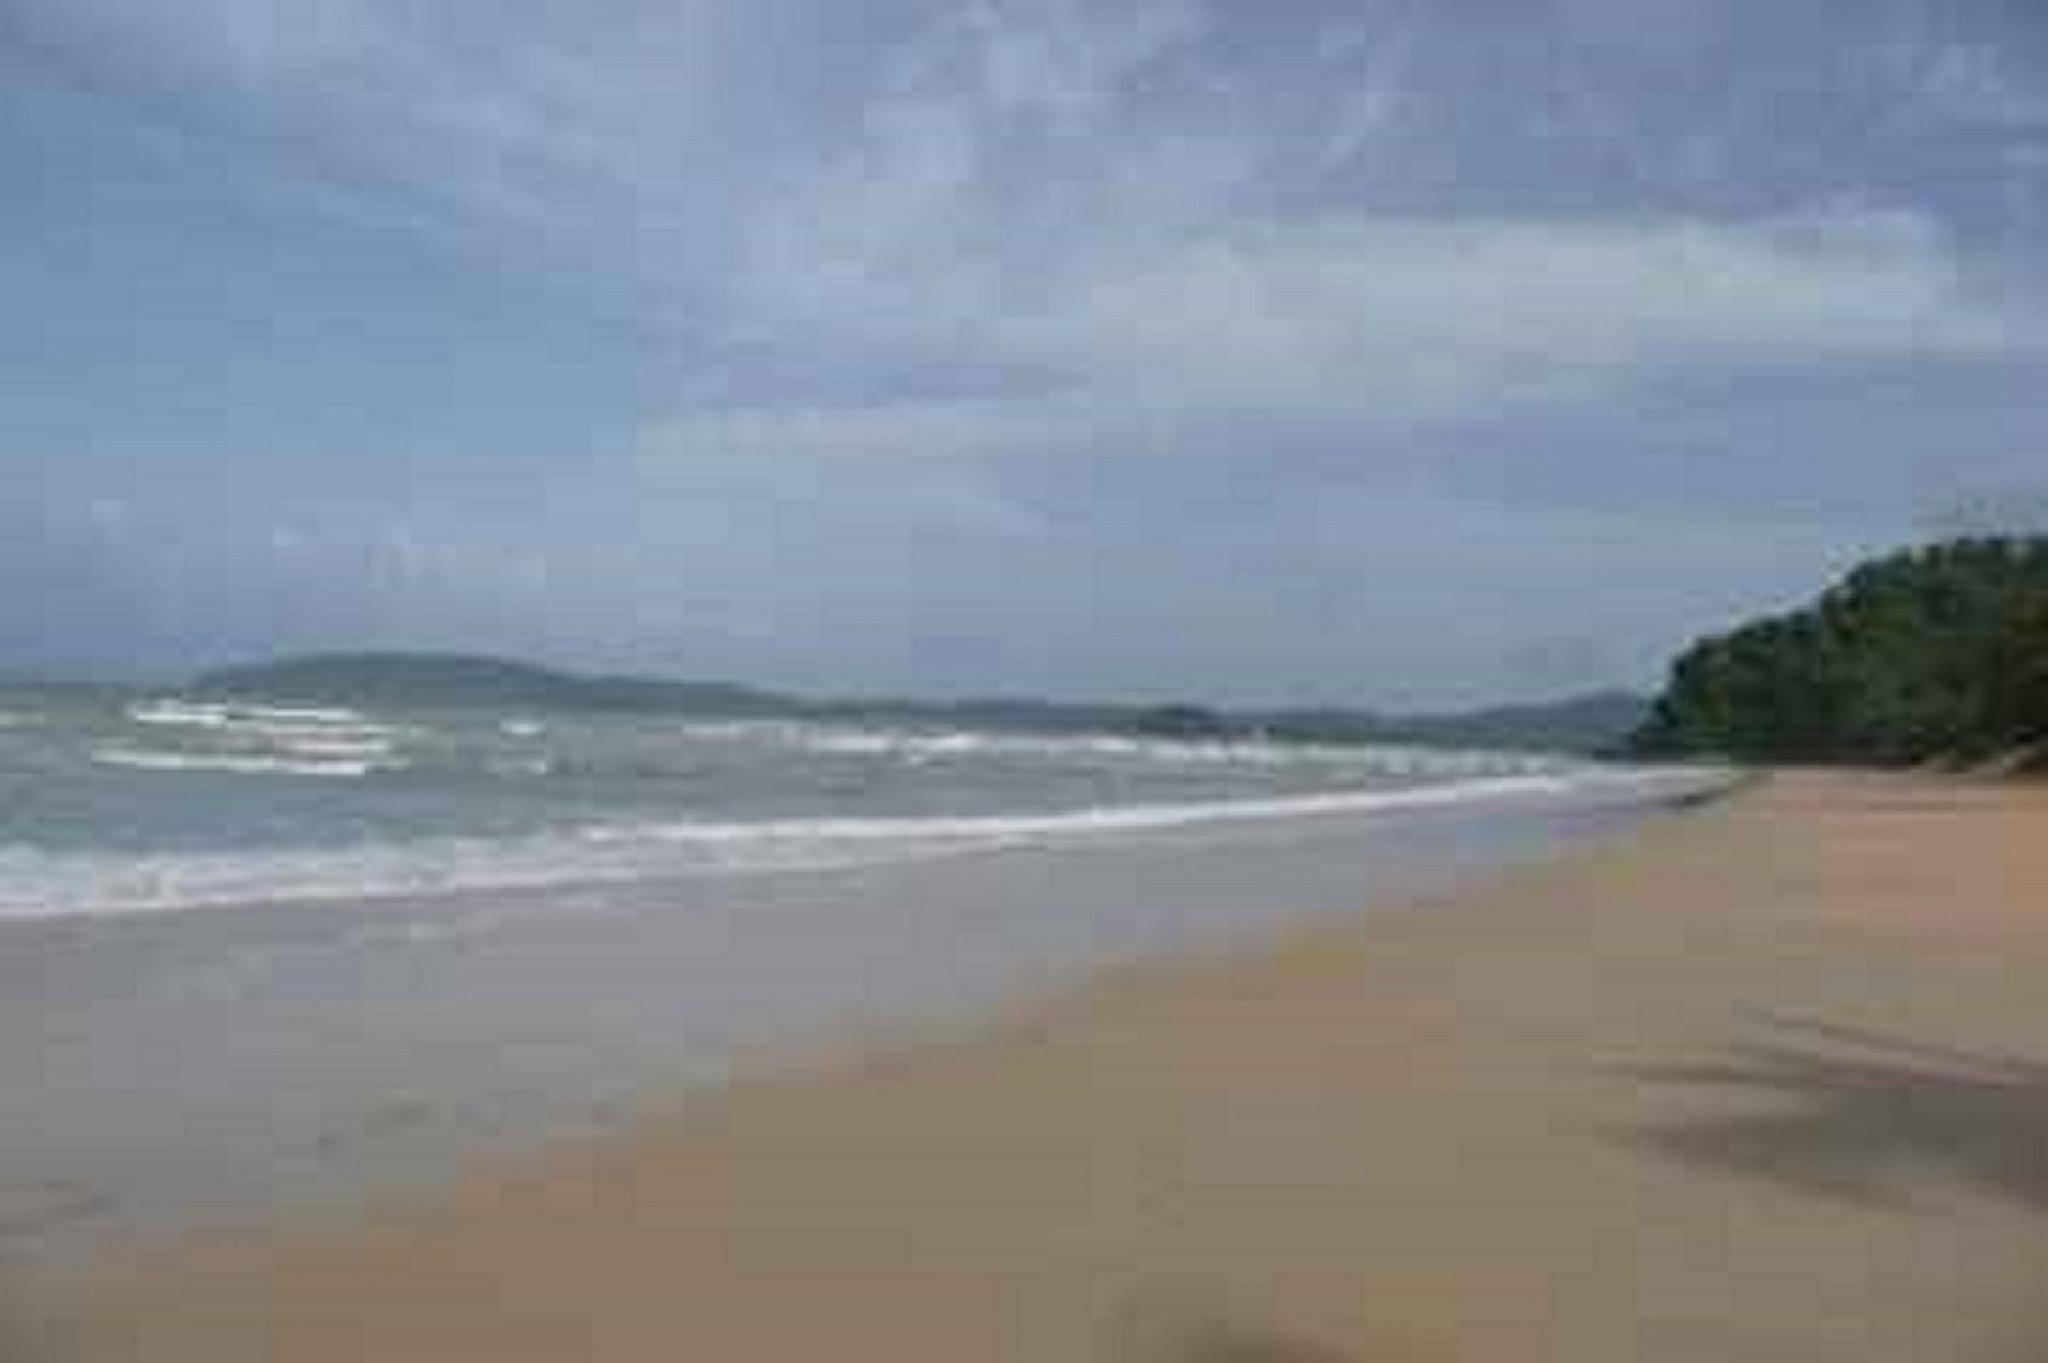 Guesthouse 2 Walkingmins From A Beautifull Beach Guesthouse 2 Walkingmins From A Beautifull Beach